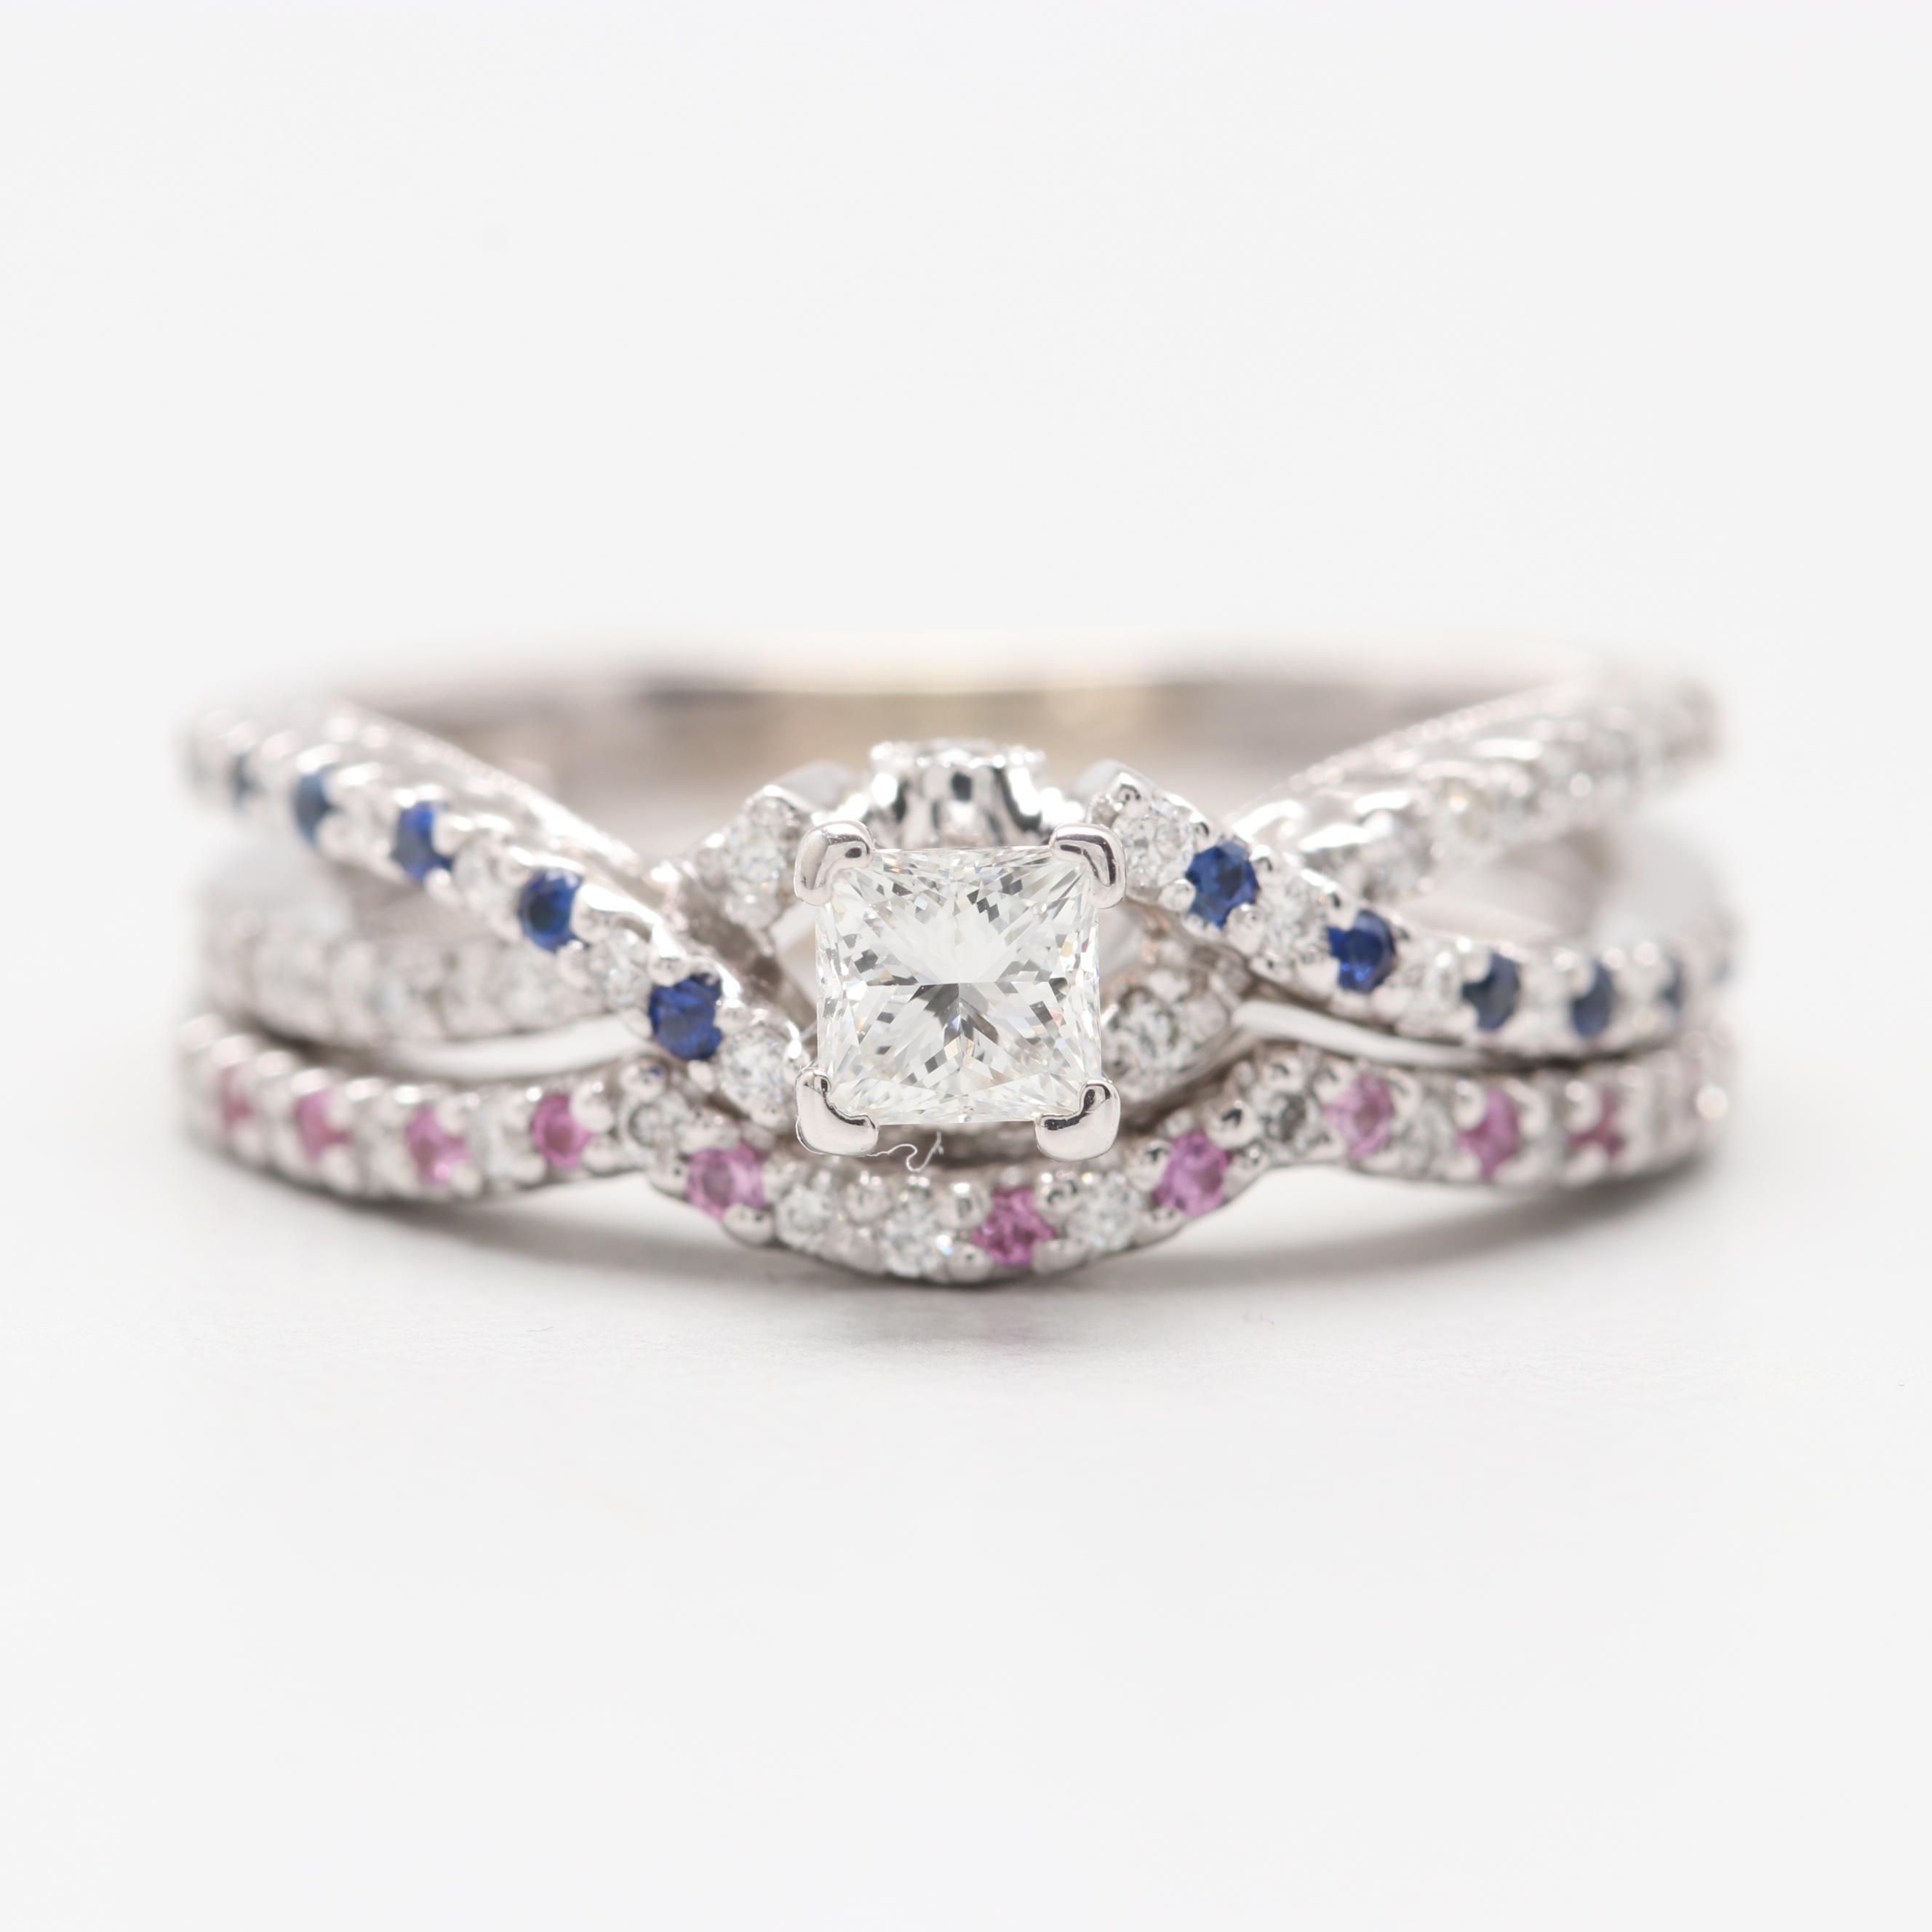 14K White Gold 0.55 CTW Diamond and Sapphire Bridal Ring Set